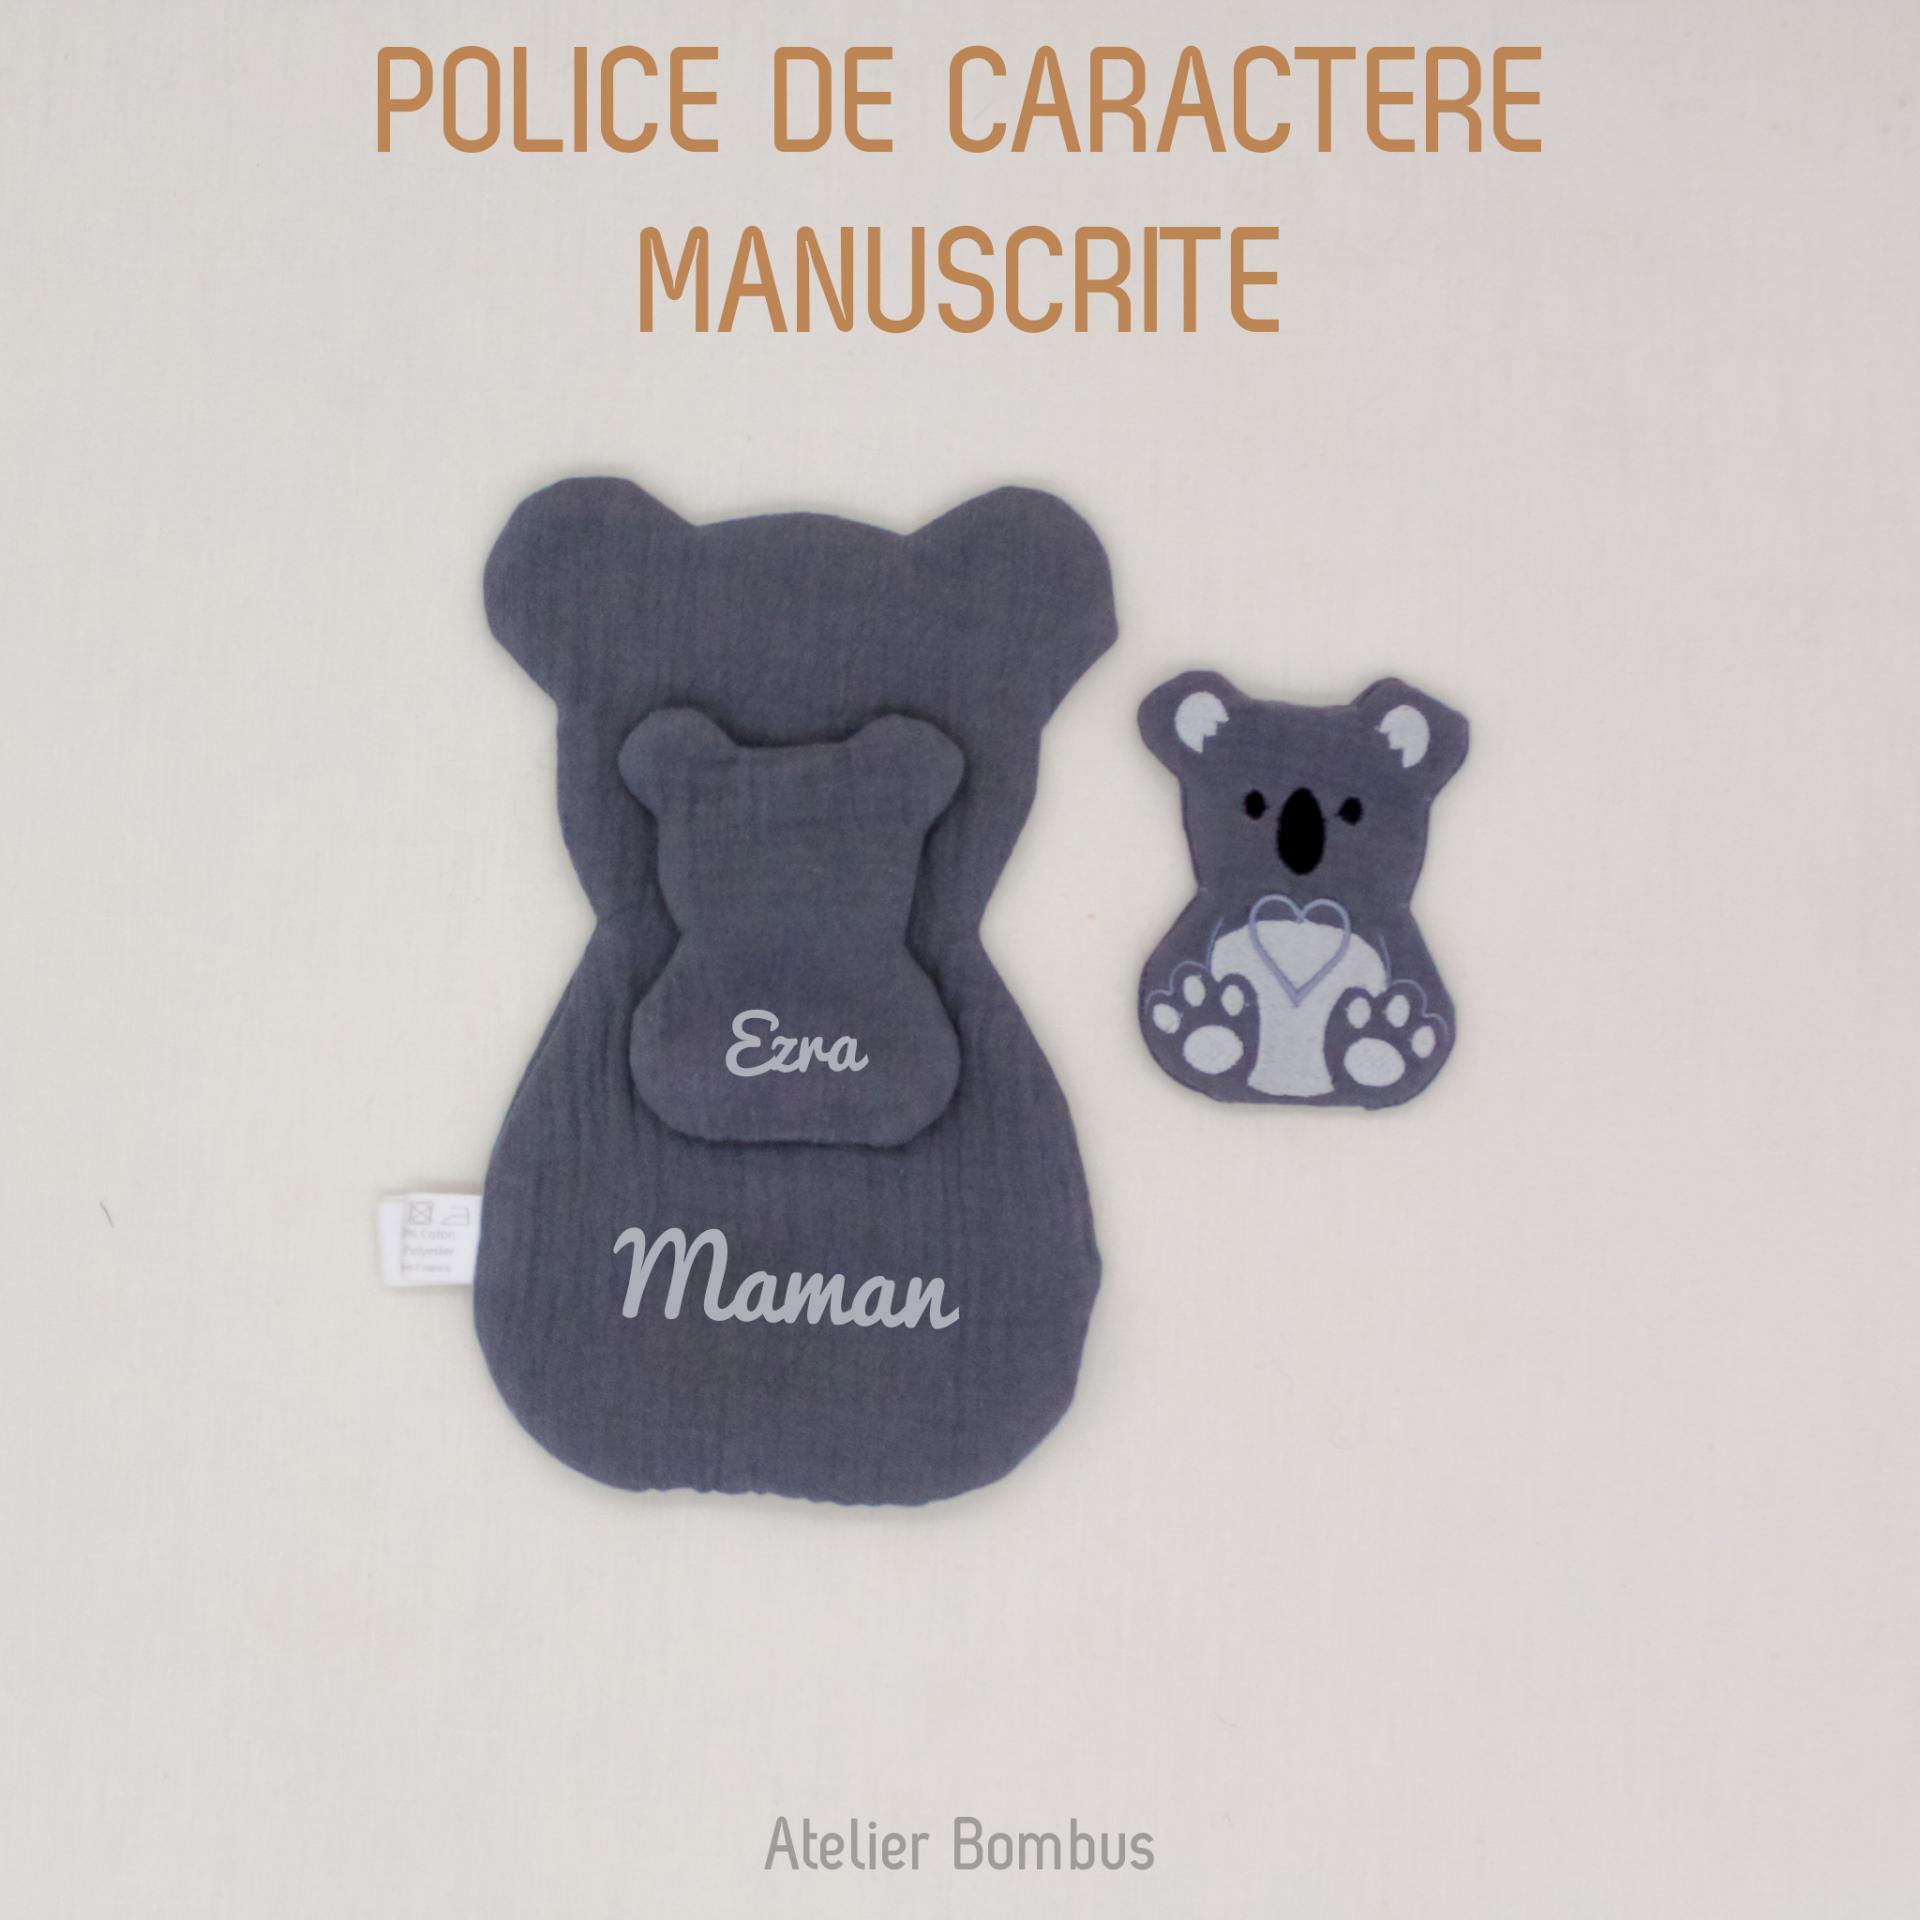 Police manuscrite